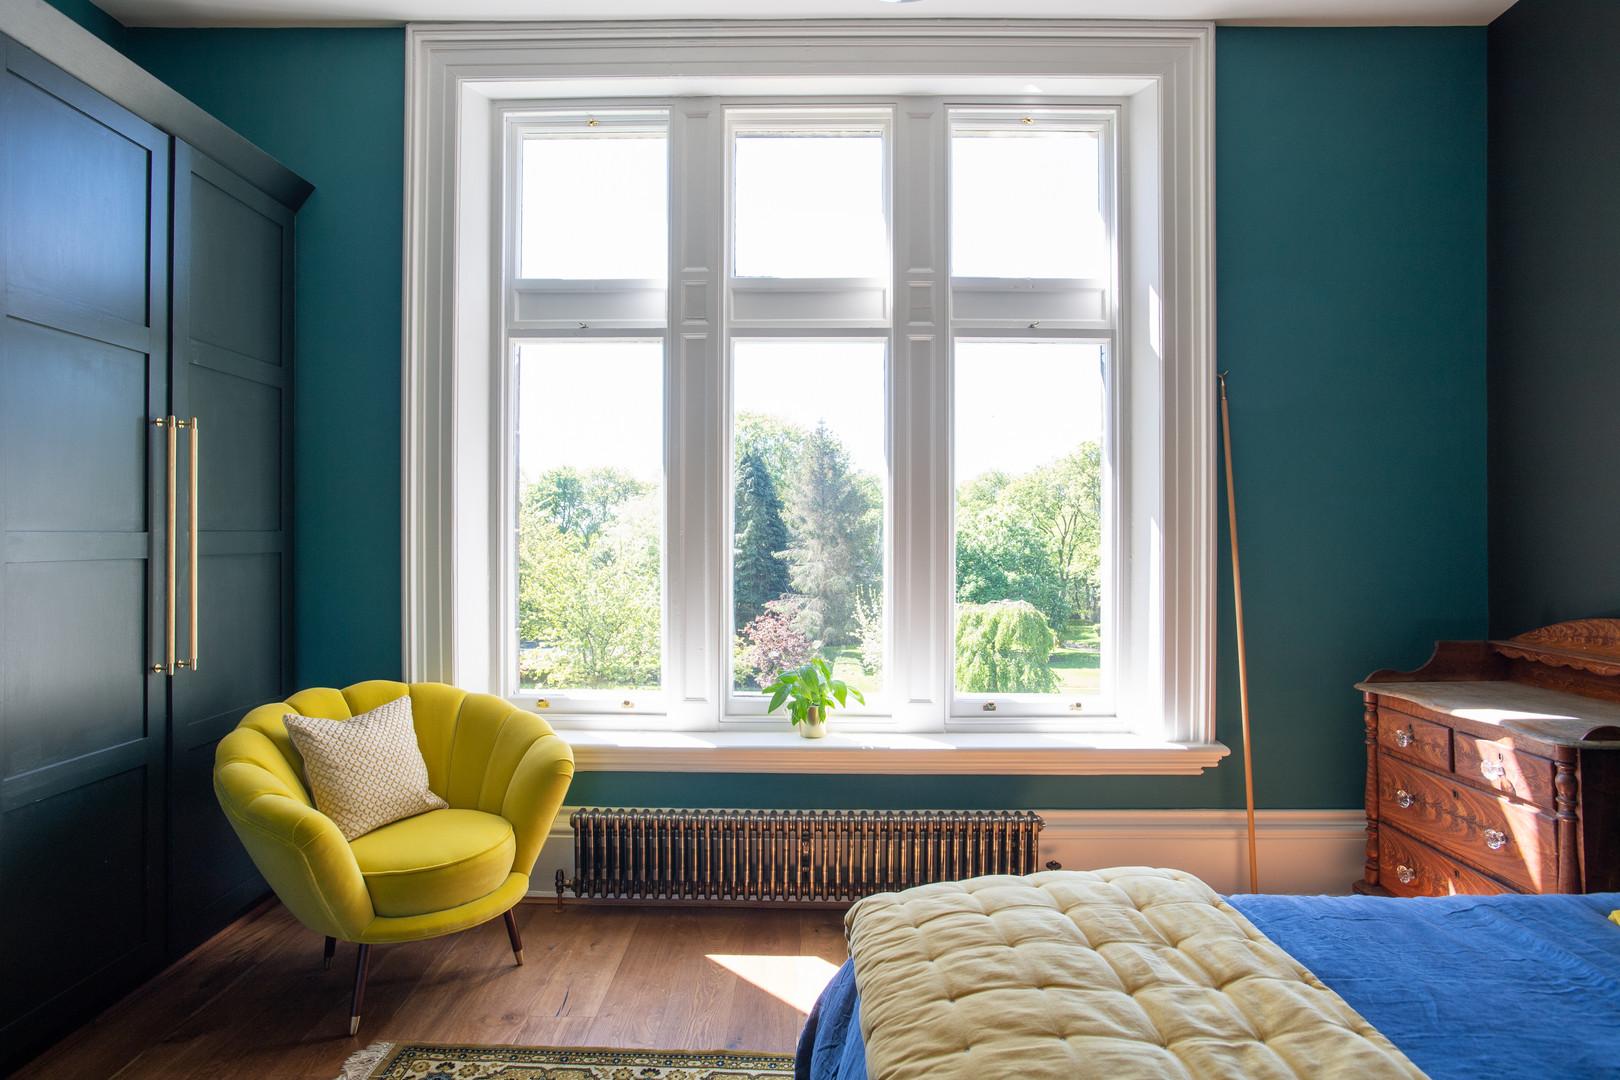 Room Interior by Sirastudio. Photographers in Harrogate.